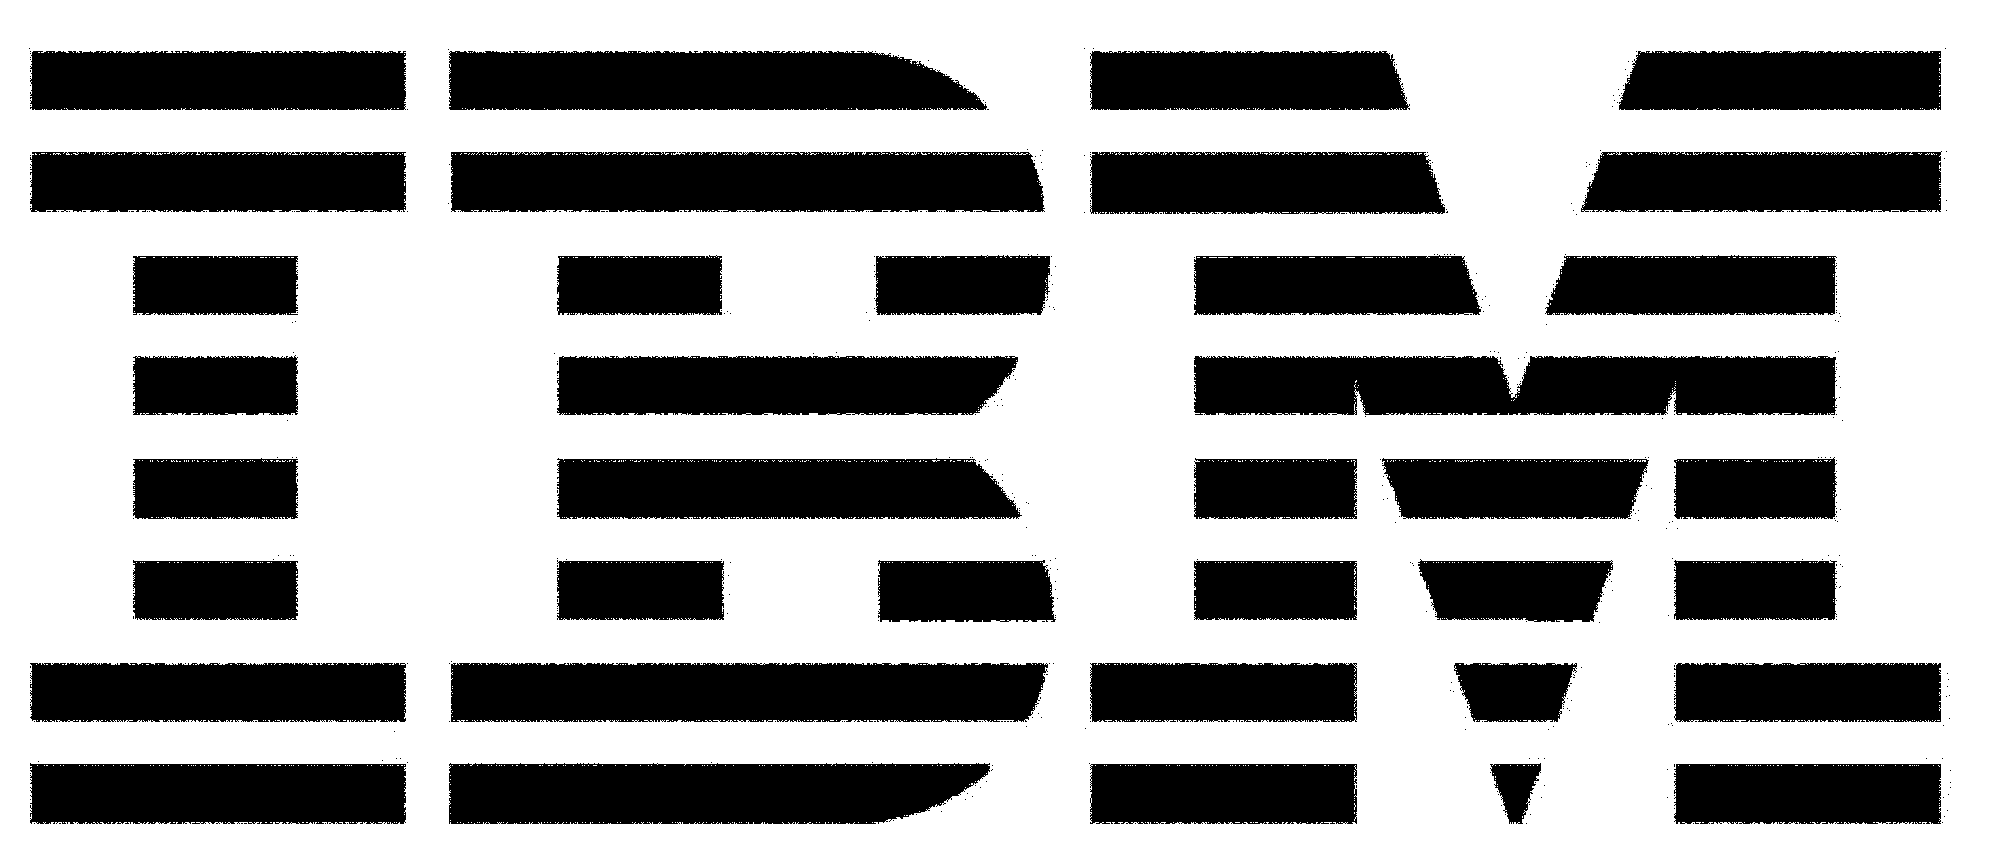 https://kapssolutions.com/wp-content/uploads/2018/08/IBM-Logo.png